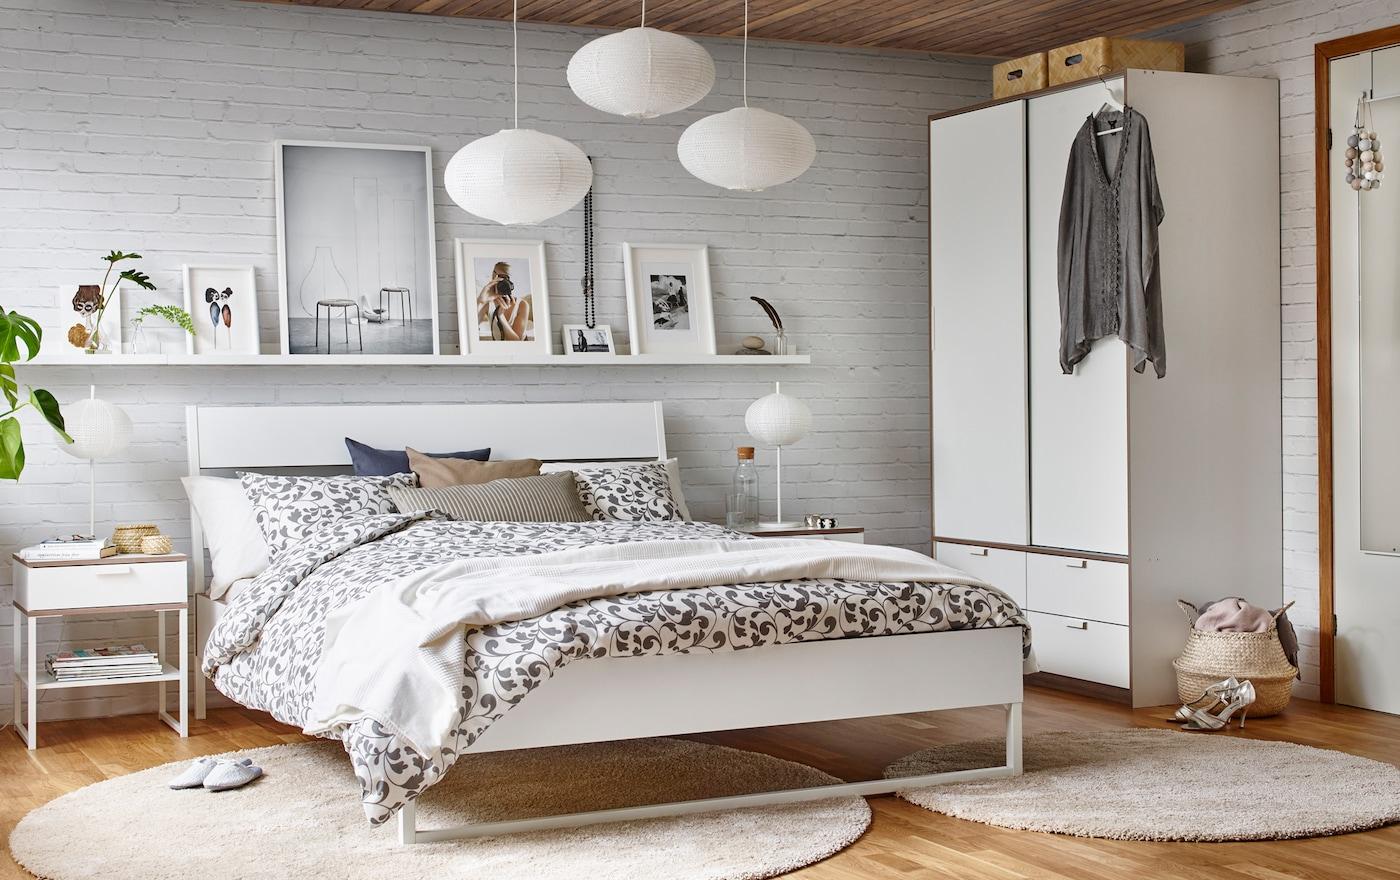 Slaapkamer Grijs Roze : Slaapkamer inspiratie u ikea ikea